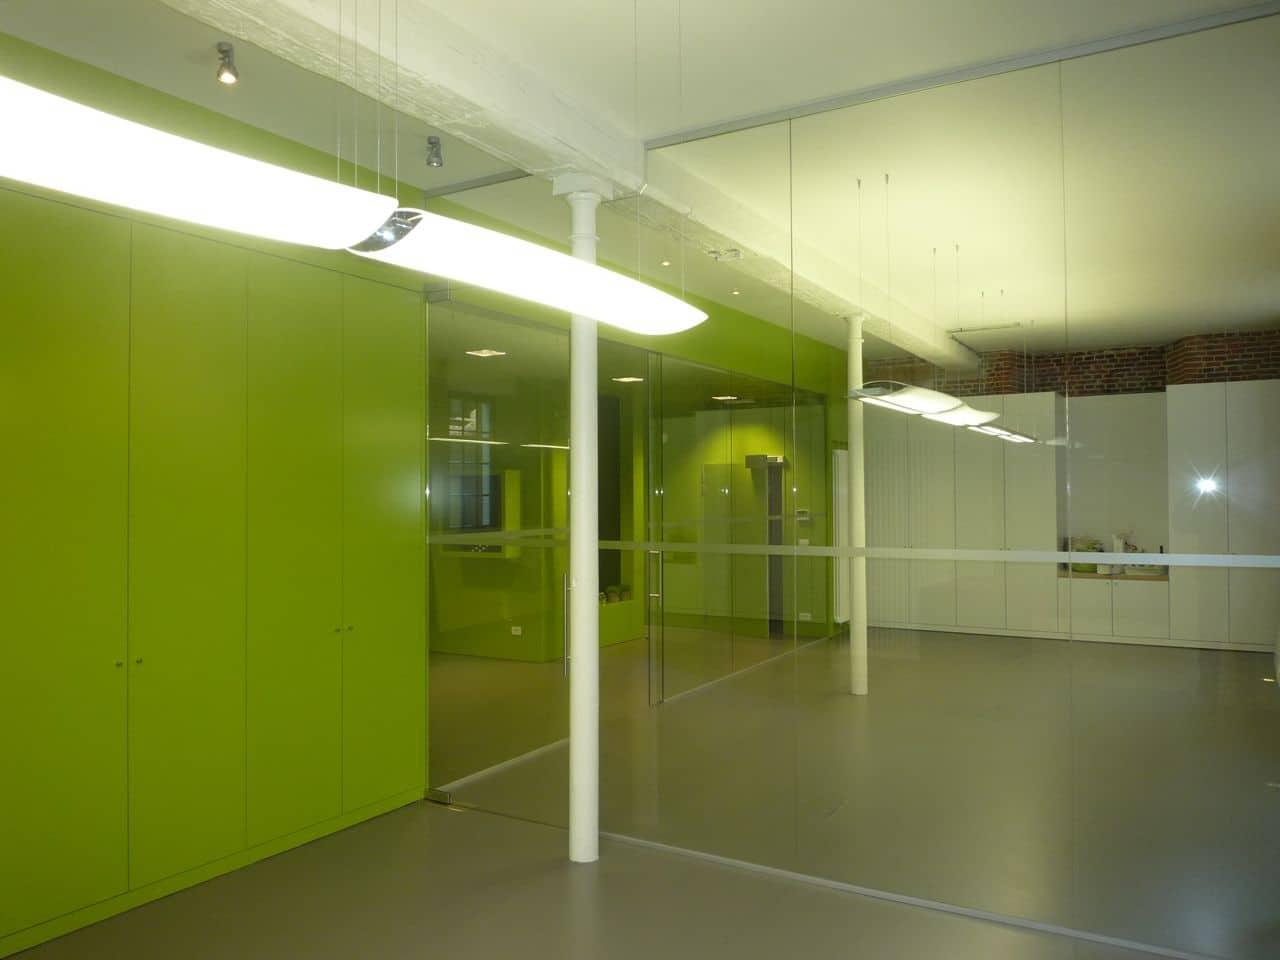 P1060731 | Baeyens & Beck architecten Gent | architect nieuwbouw renovatie interieur | high end | architectenbureau